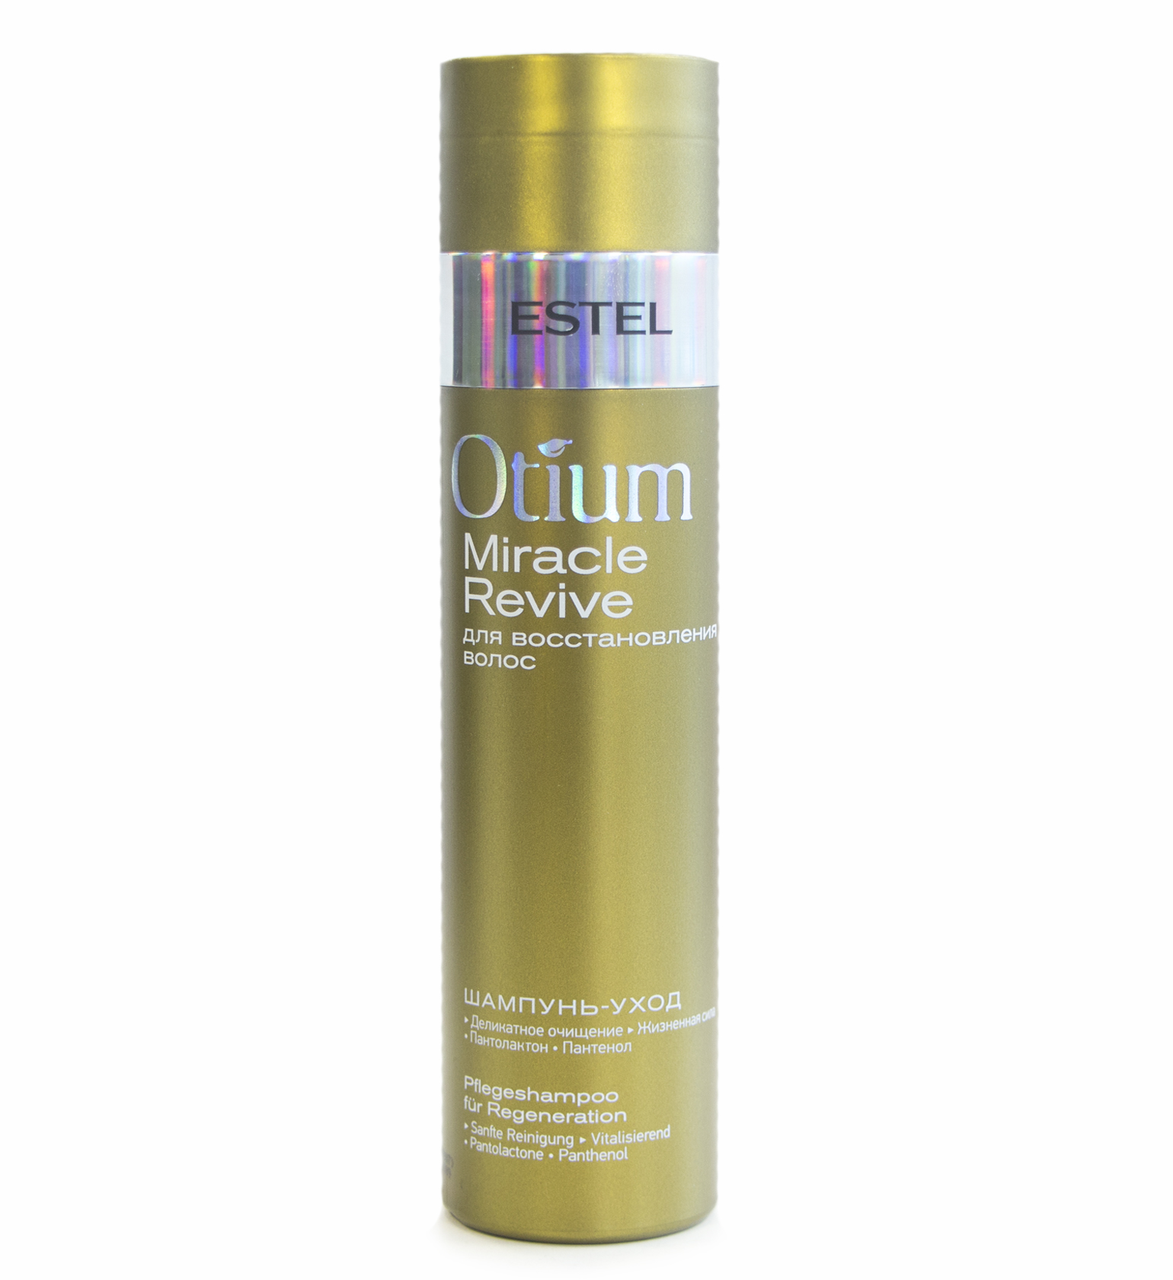 OTIUM mini - Шампунь-уход для восстановления волос OTIUM MIRACLE REVIVE